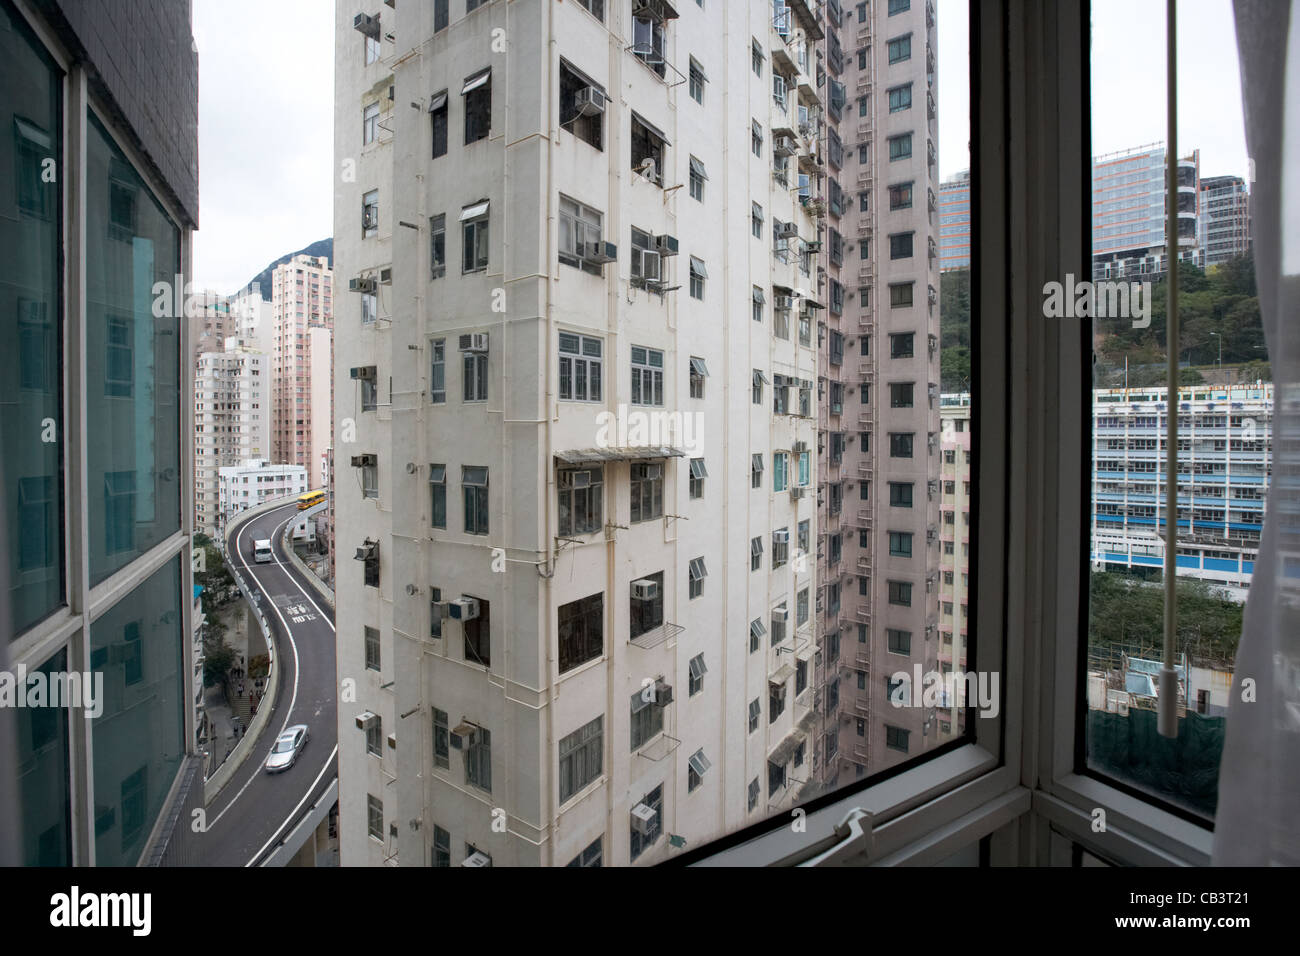 looking out from hotel window at high rise close proximity housing apartments hong kong island hksar china - Stock Image